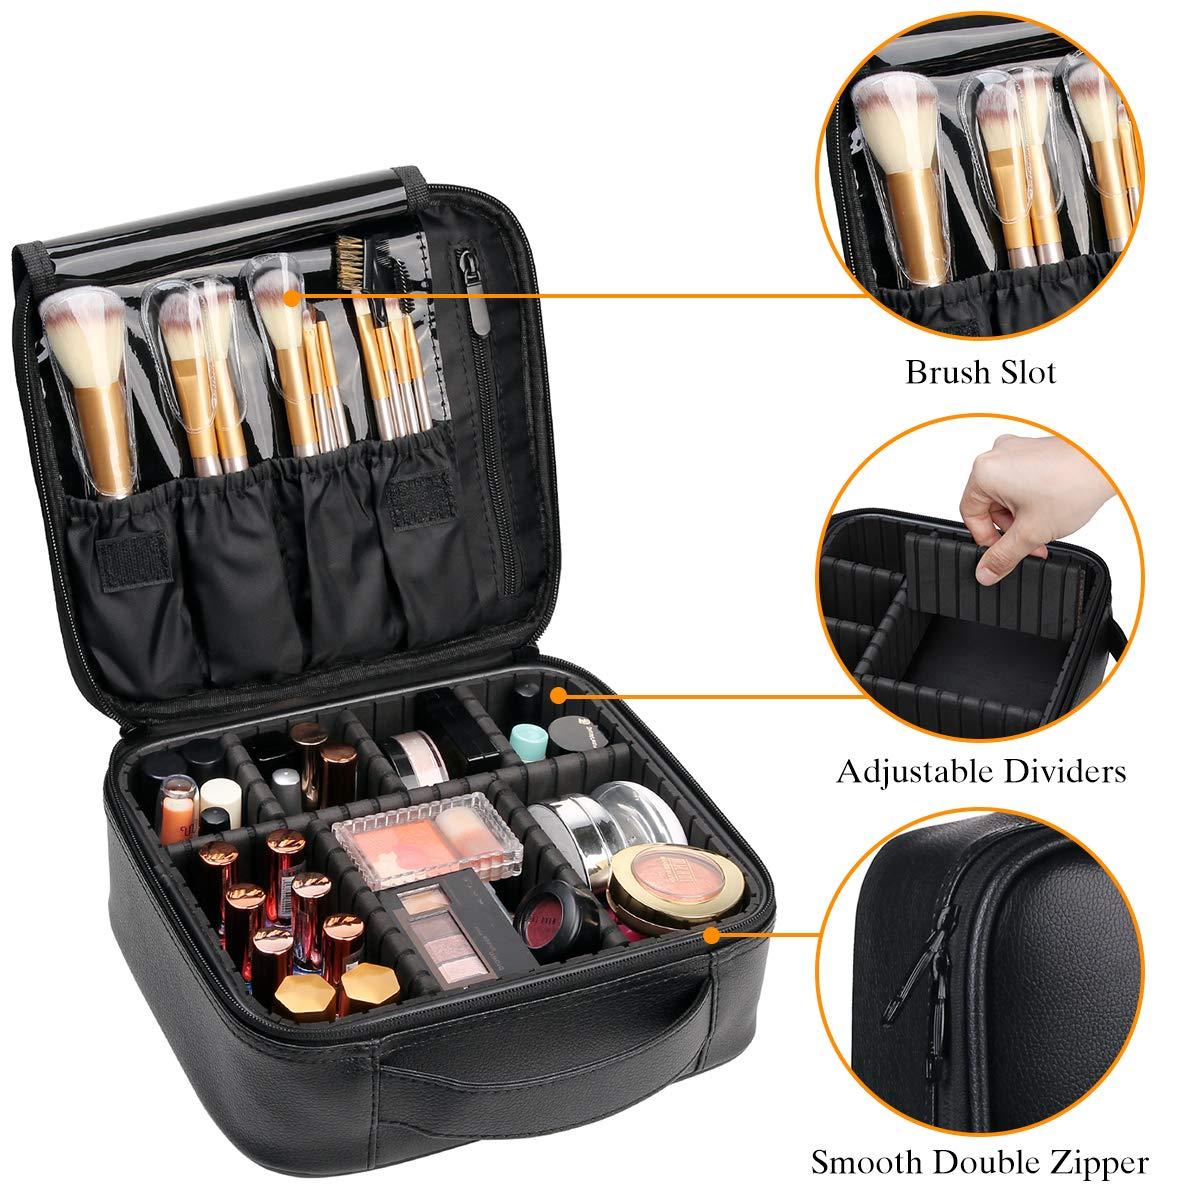 Amazon coupon code for Makeup Case Travel Makeup Bags Organizer for Women Professional